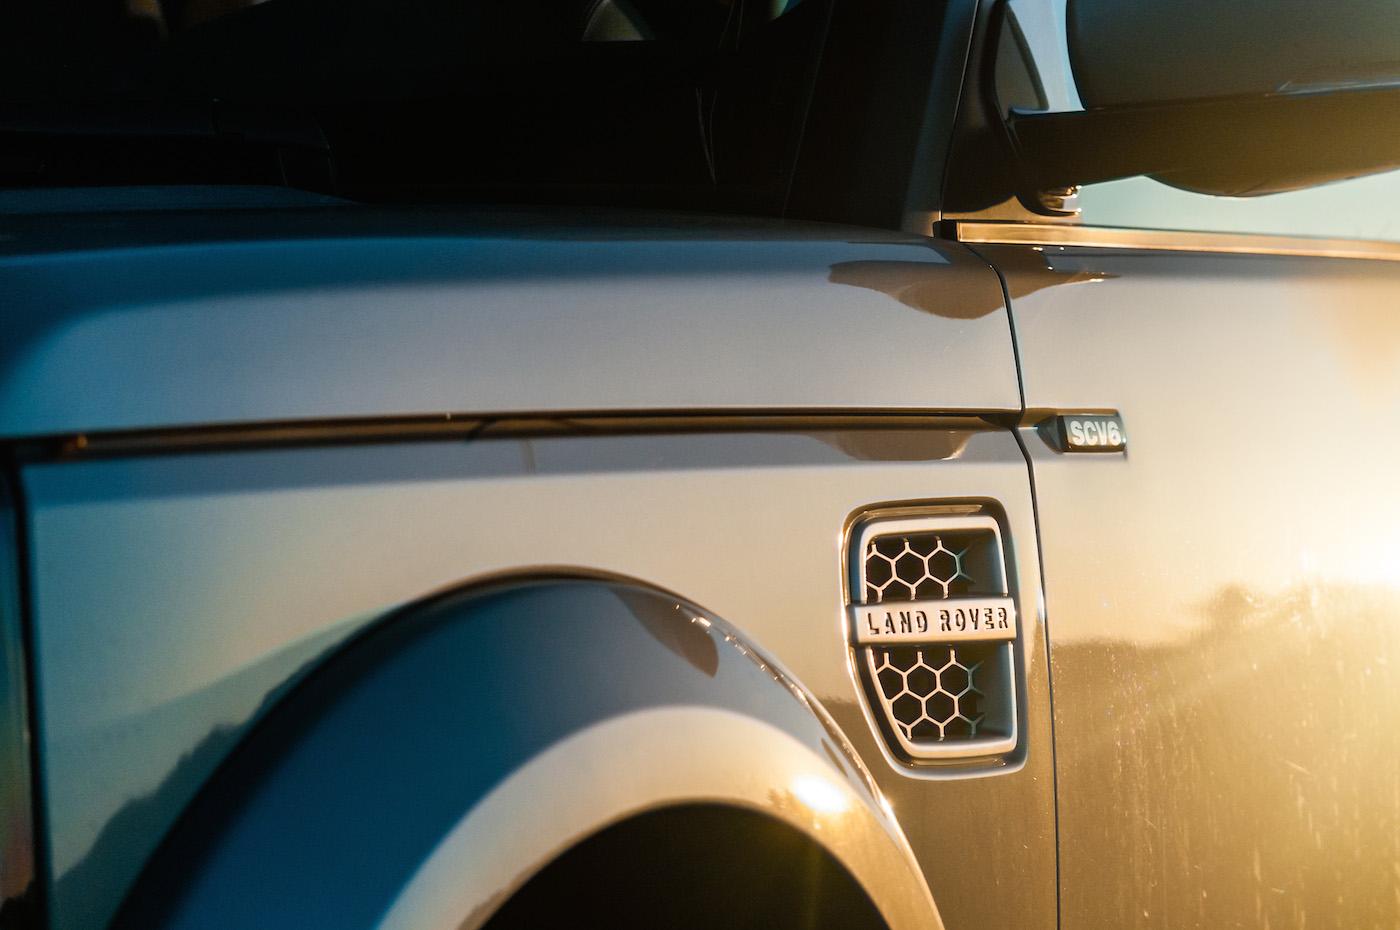 Land Rover LR43